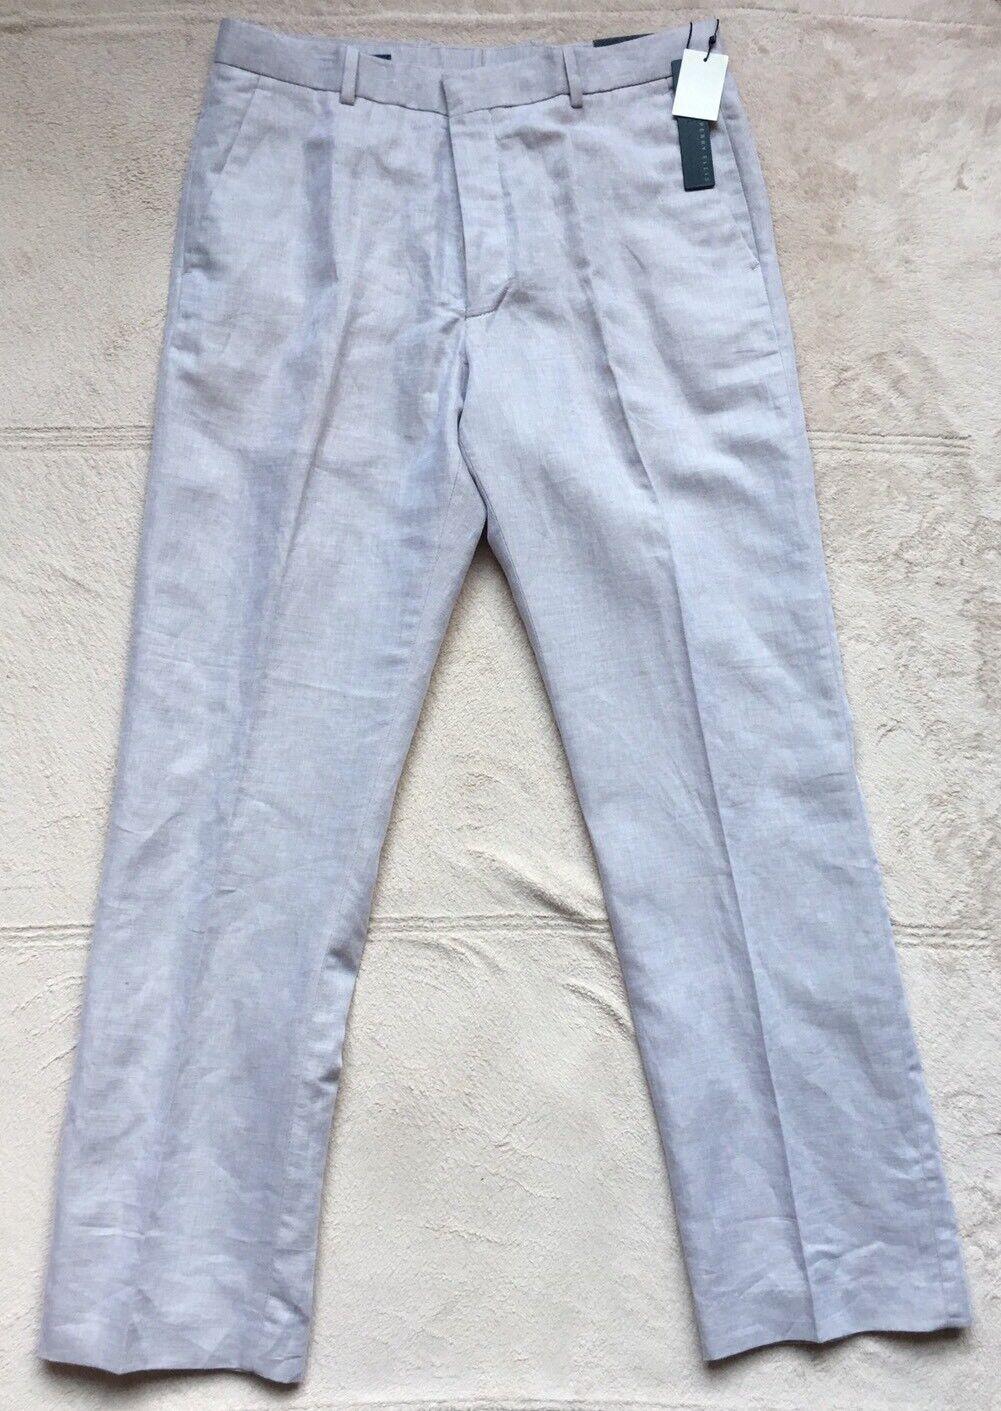 Perry Ellis Mens Natural Linen Core Pants, 32 X 32, Natural, Beige, New w  Tags